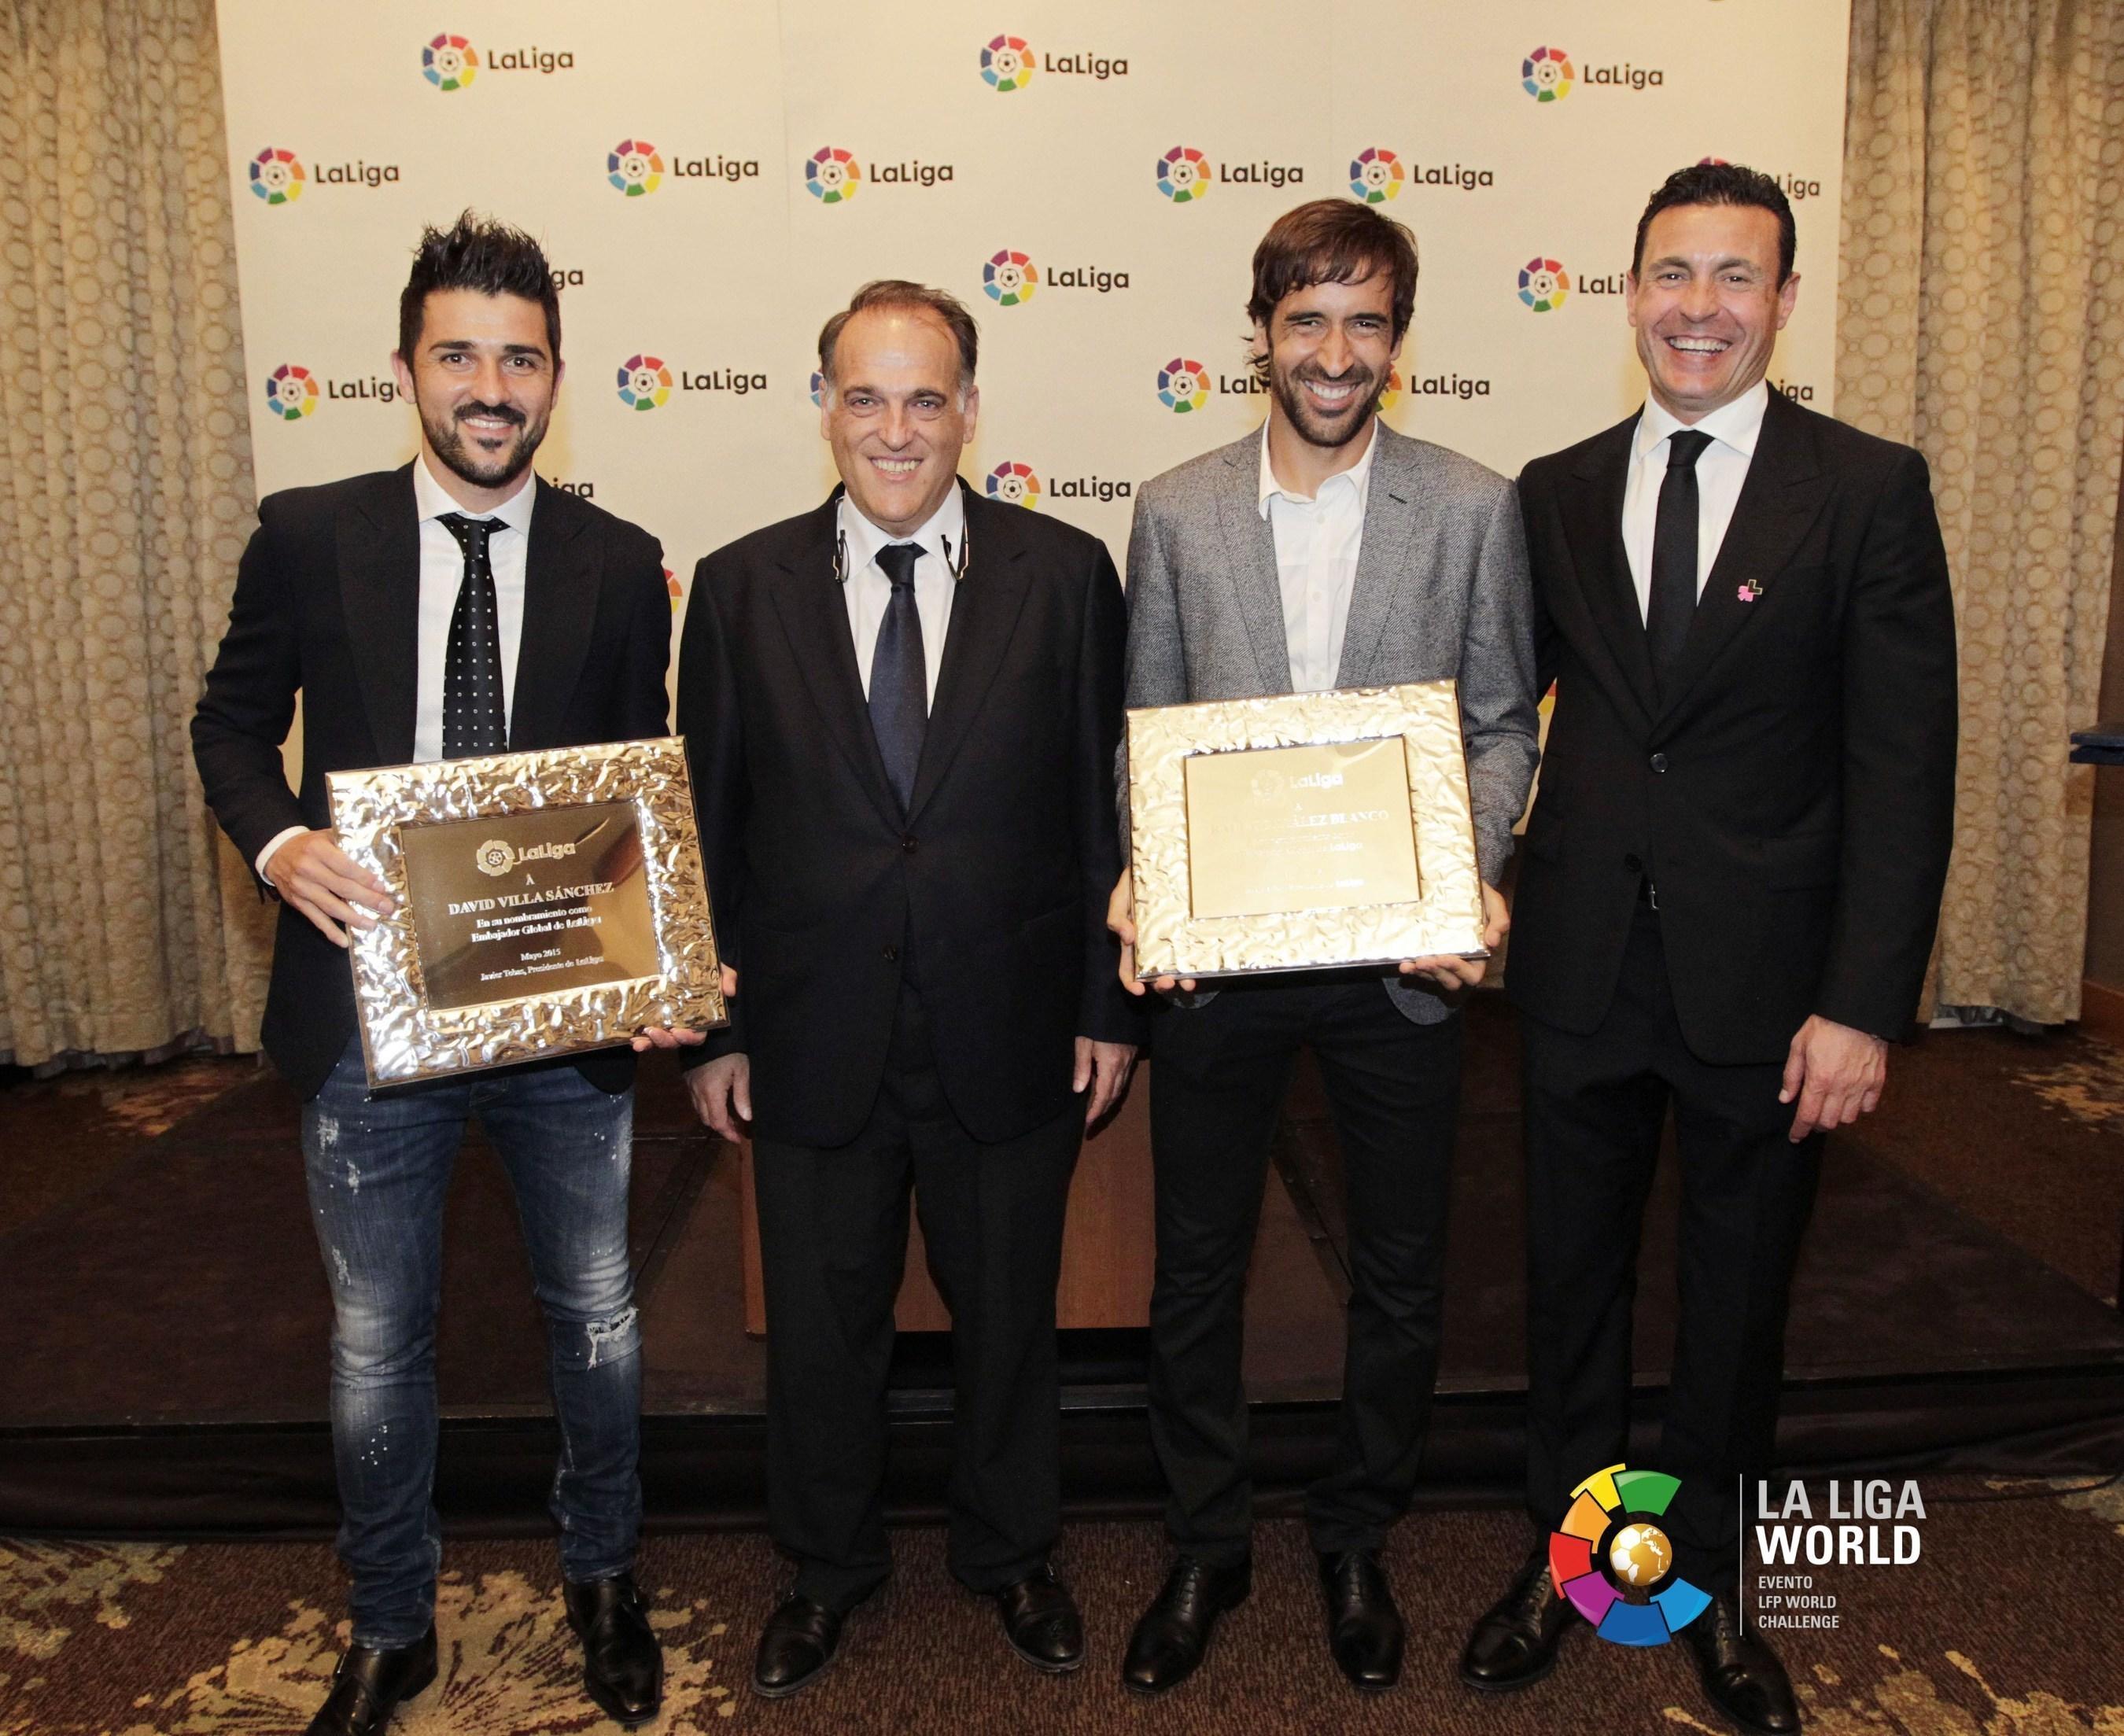 From the left, David Villa, LaLiga President Javier Tebas, Raul Gonzalez and Valencia CF President Amadeo Salvo